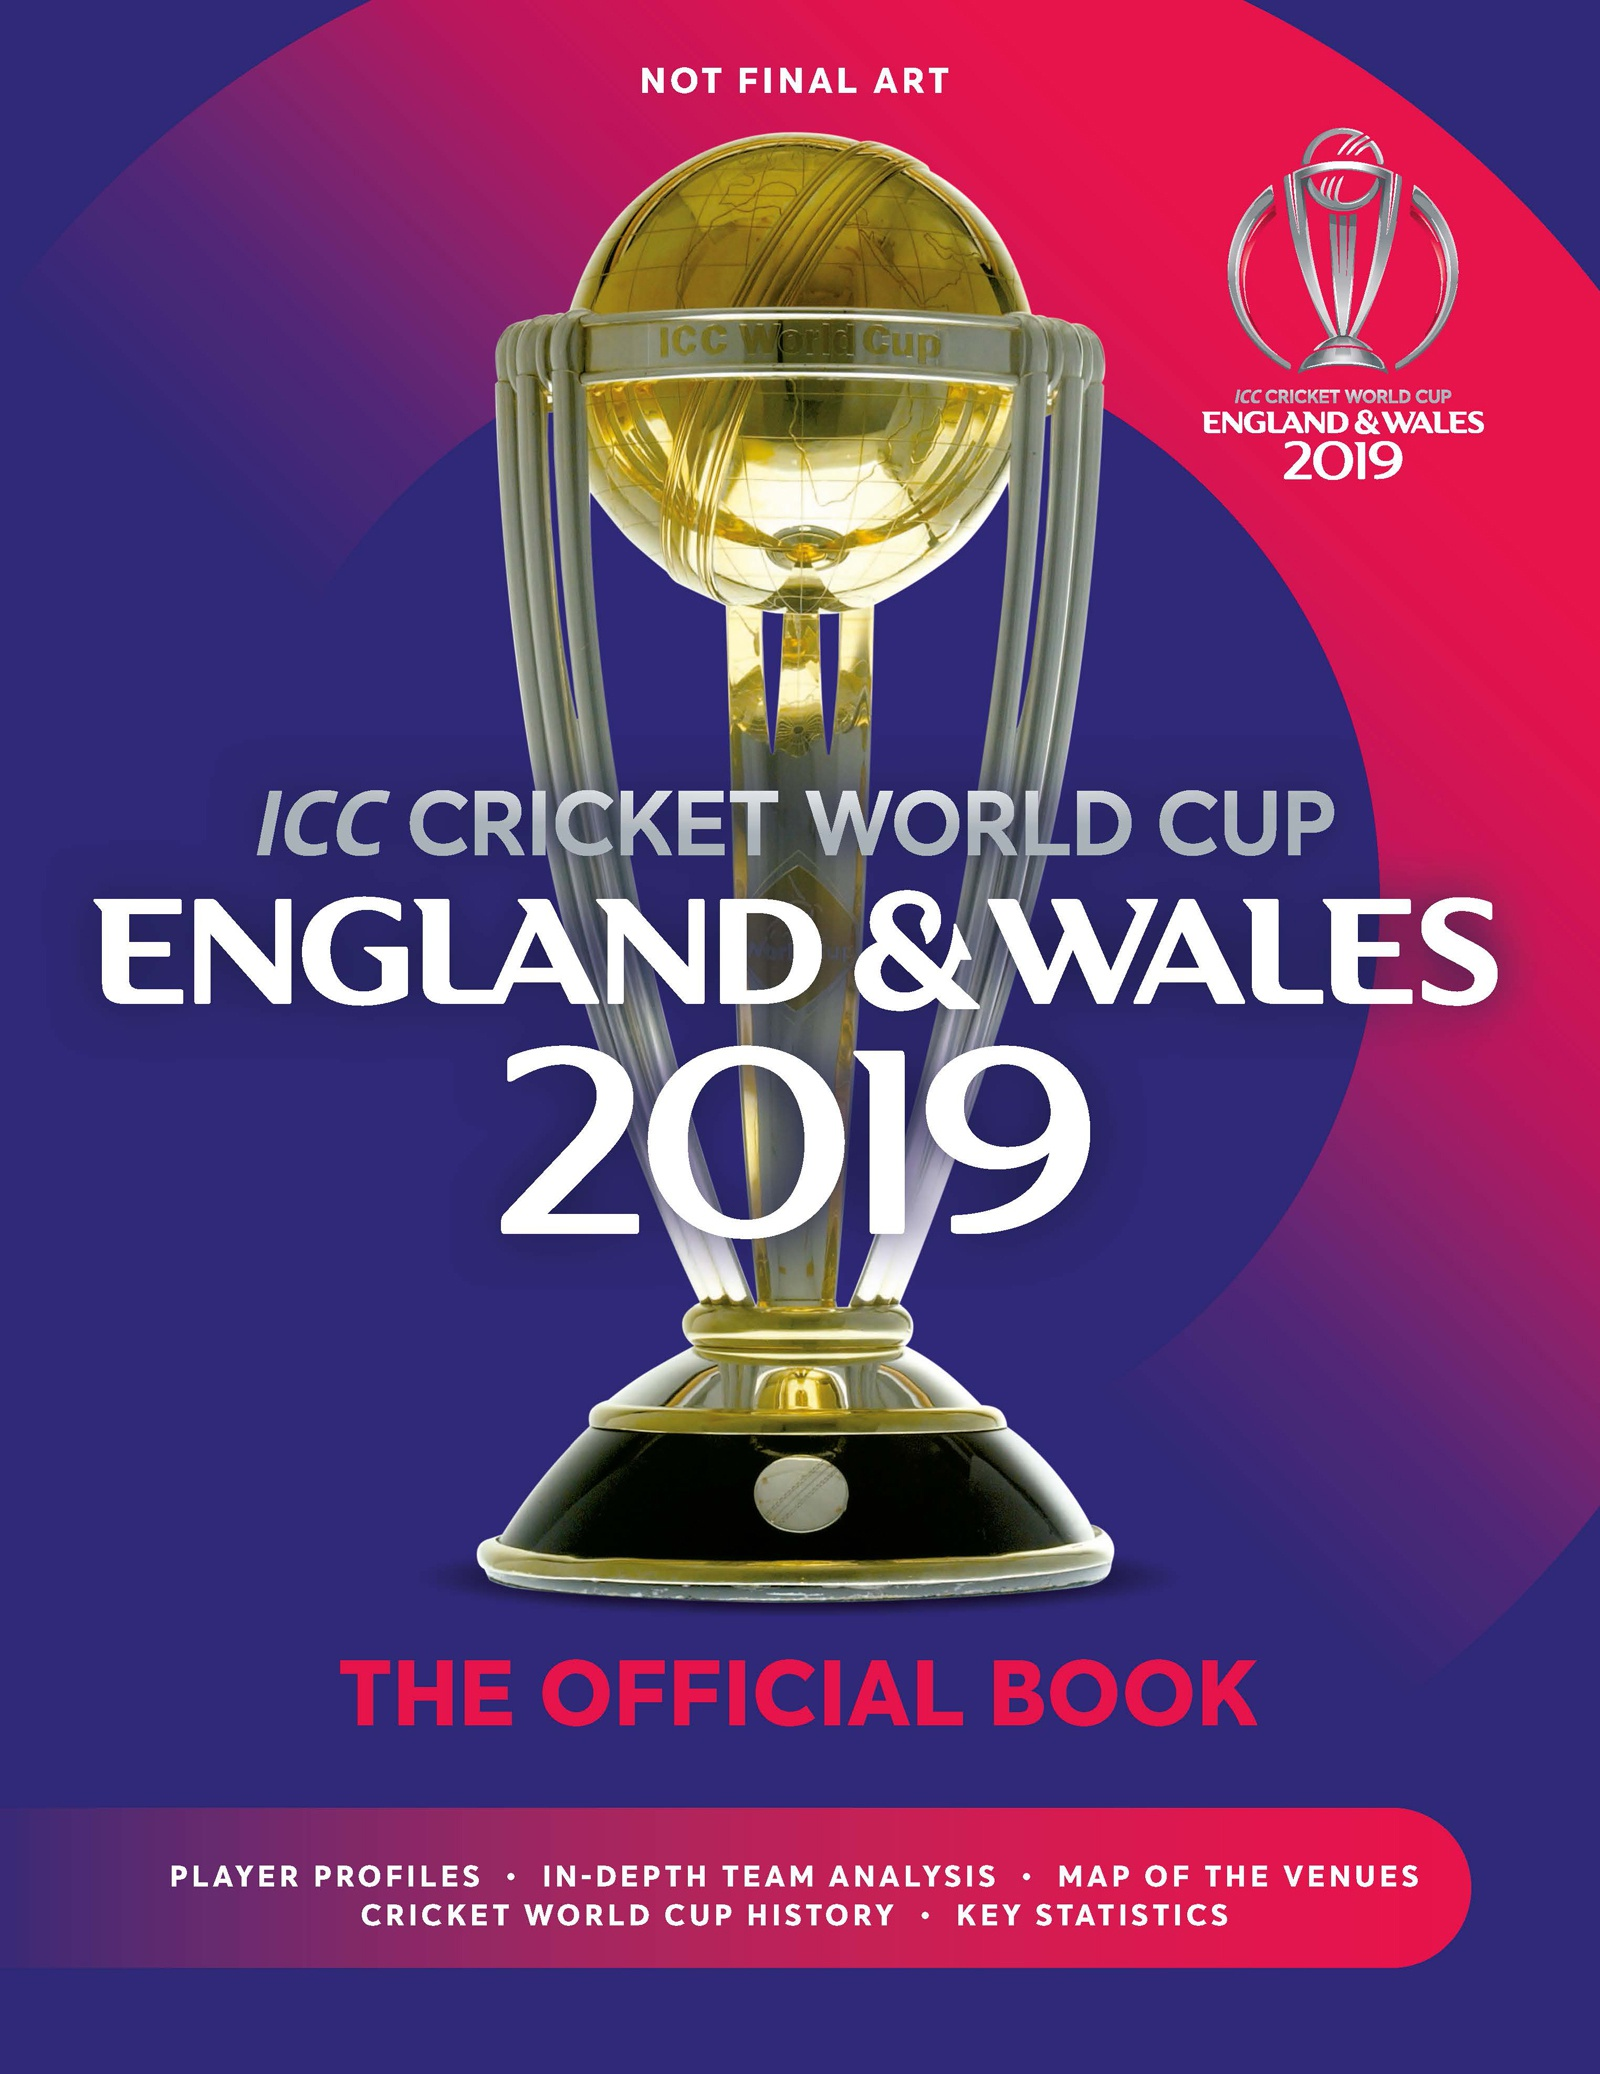 ICC Cricket World Cup England & Wales 2019 - Chris Hawkes - 9781787392199 -  Allen & Unwin - Australia